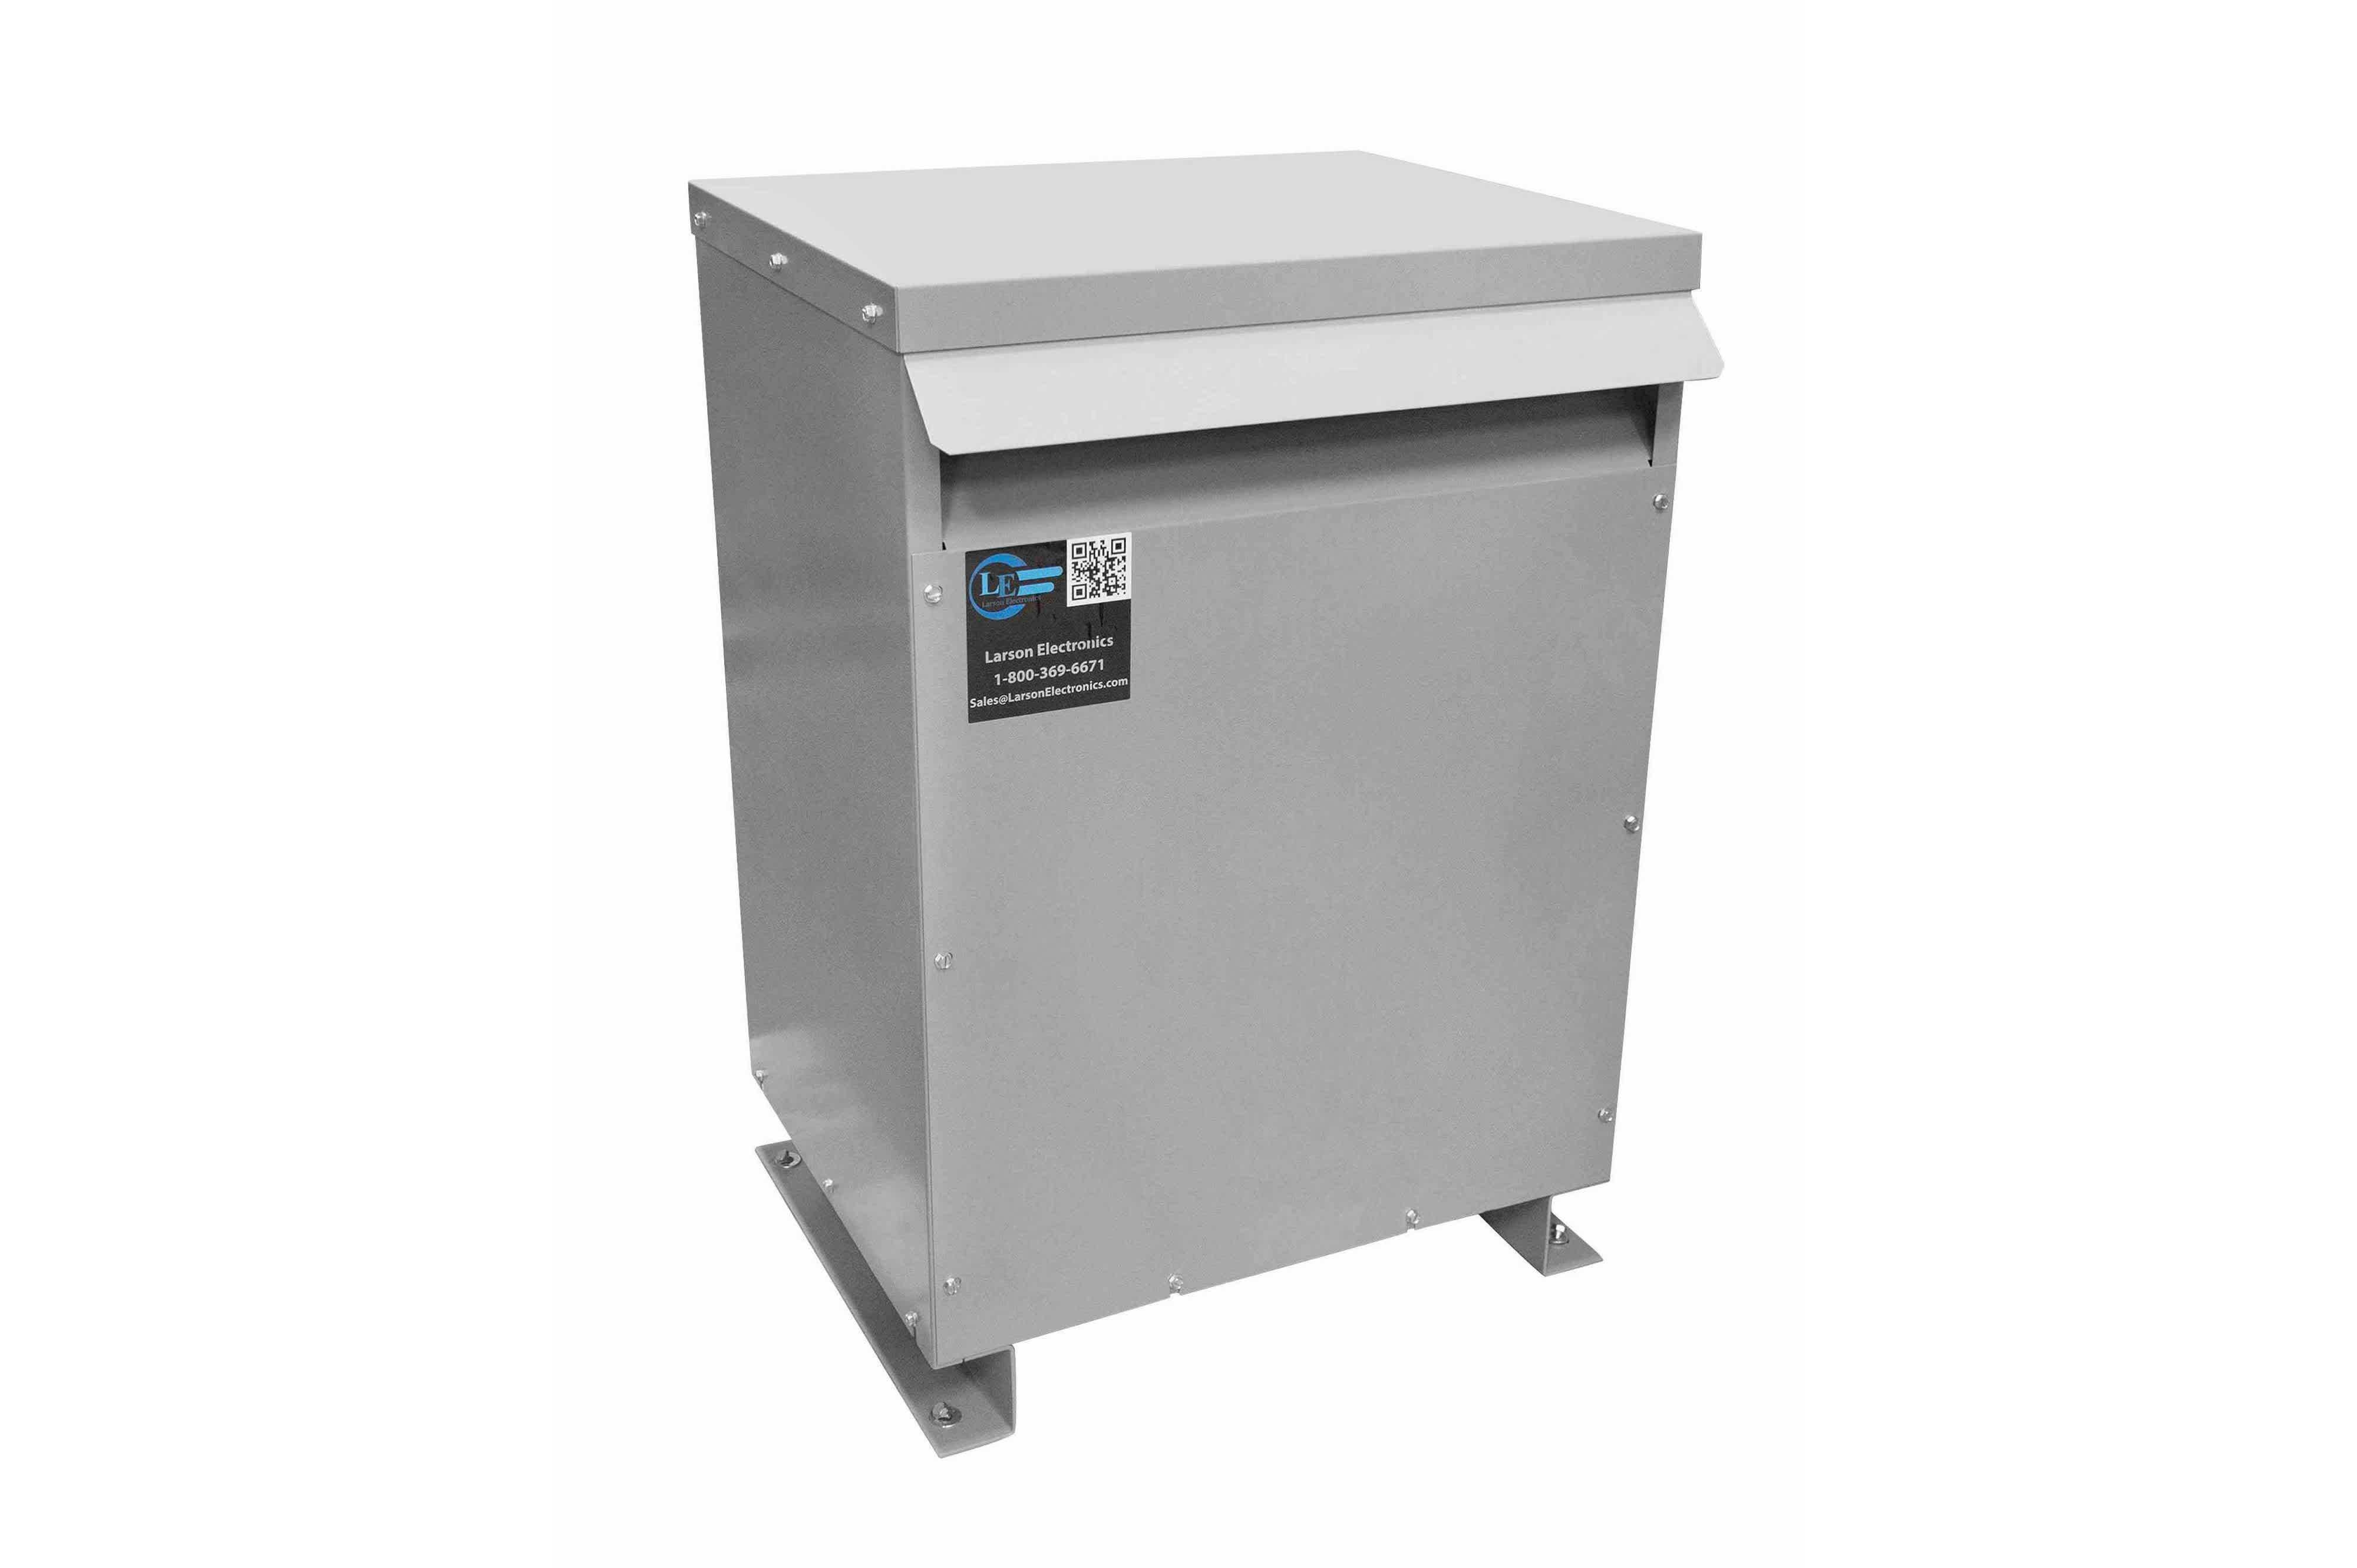 600 kVA 3PH Isolation Transformer, 575V Wye Primary, 400Y/231 Wye-N Secondary, N3R, Ventilated, 60 Hz